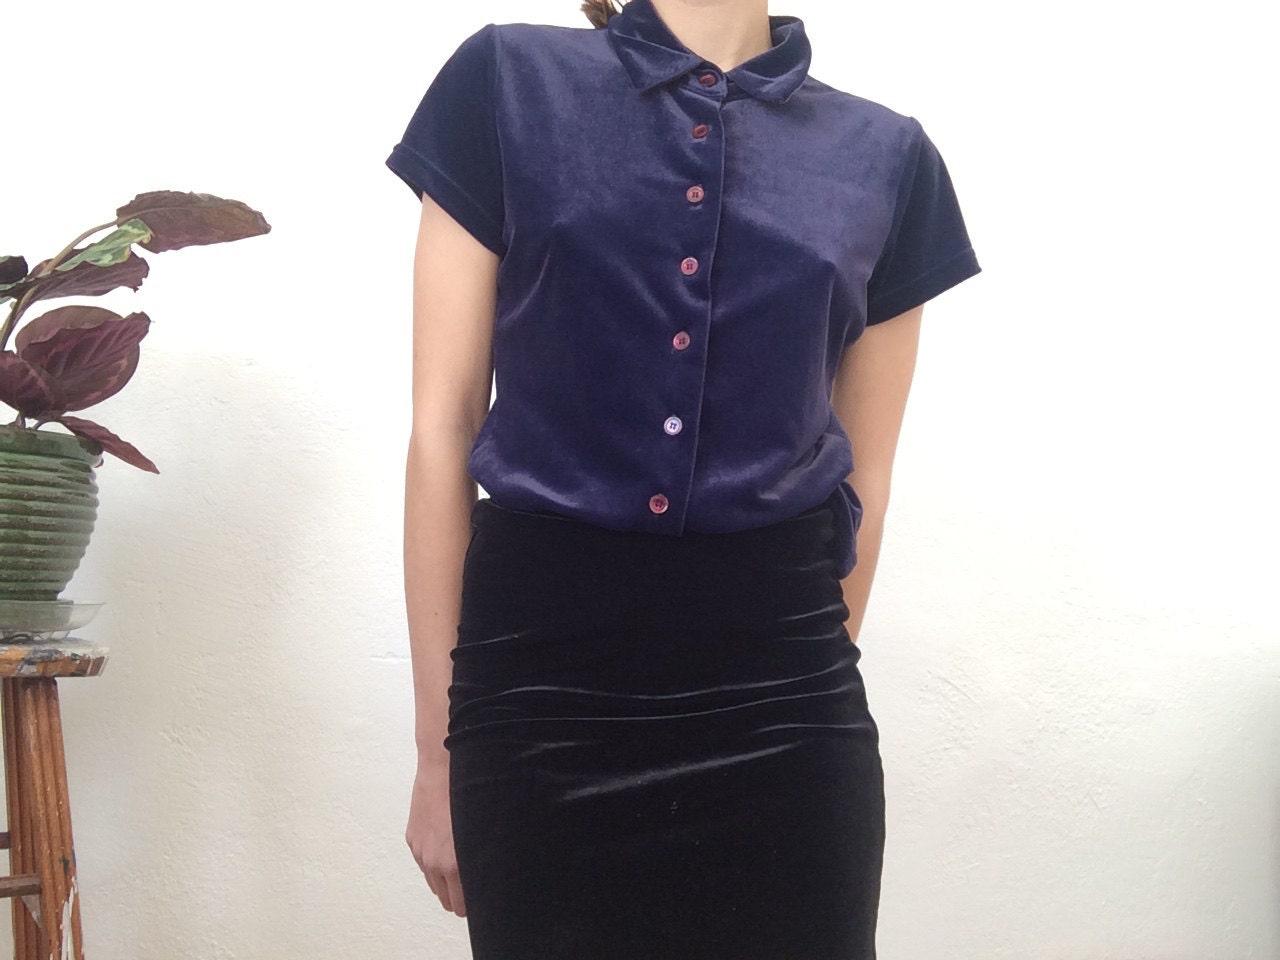 Indigo Velvet Button Up Shirt Collared Short By